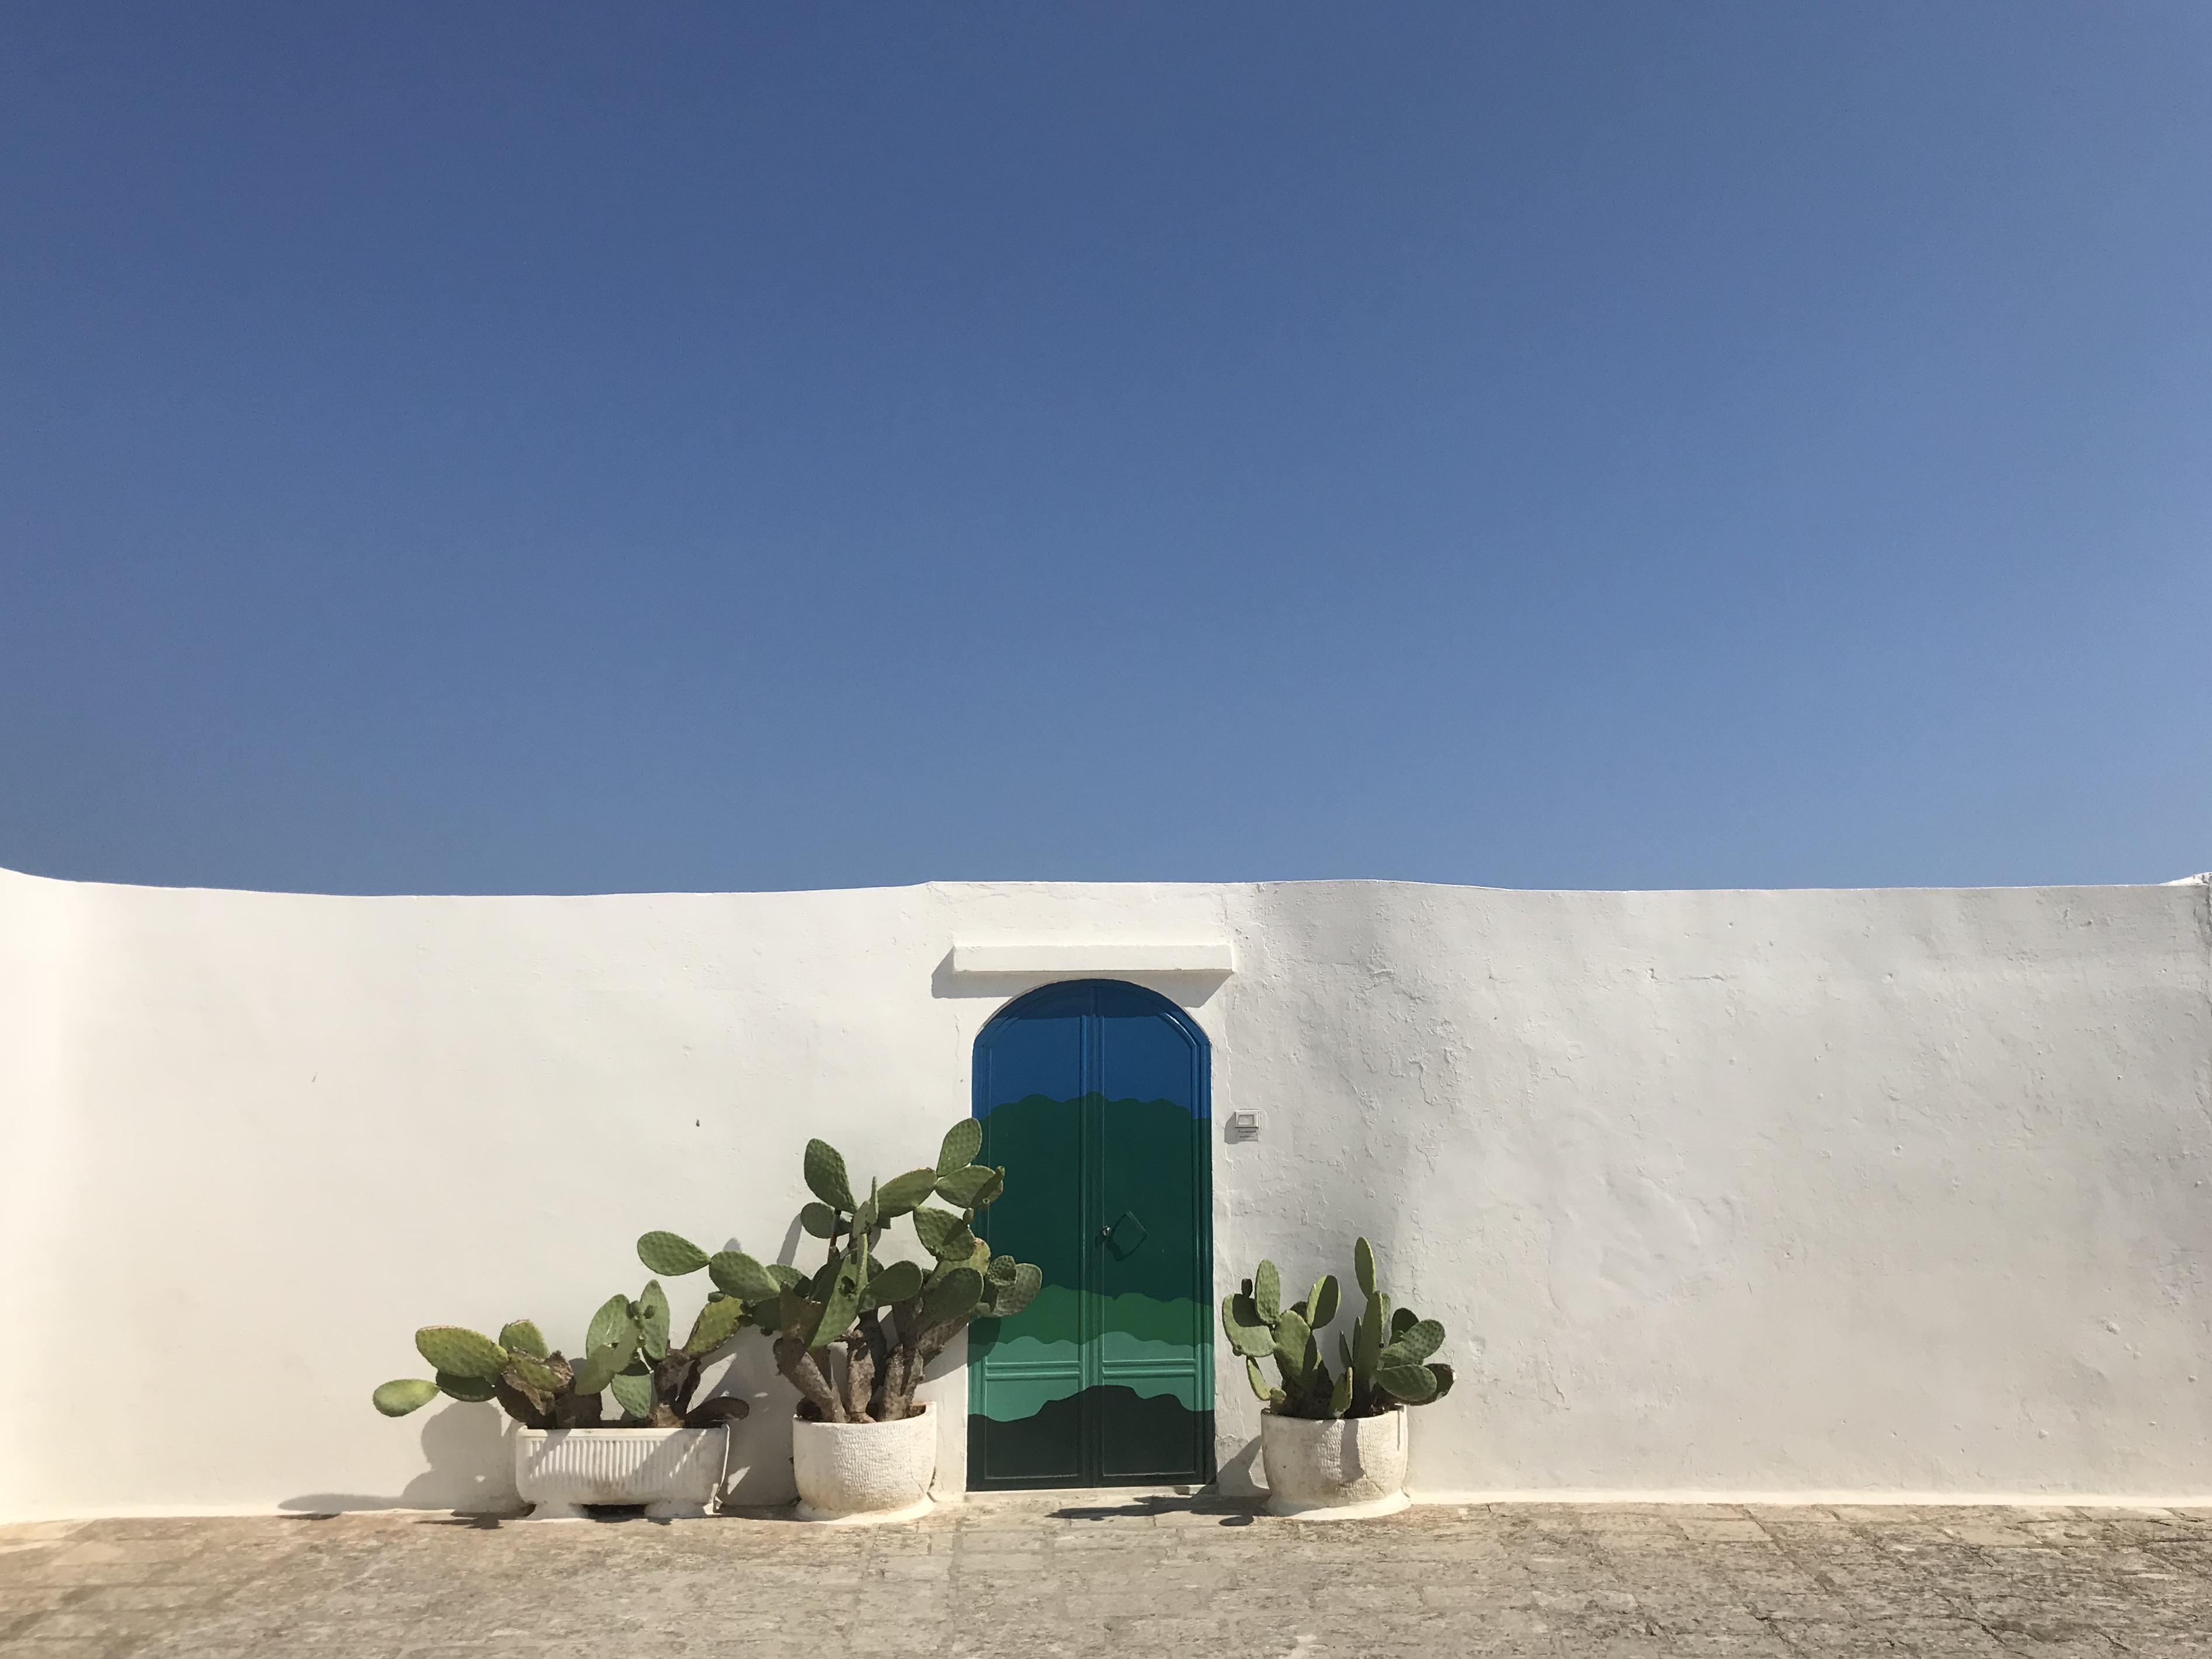 porta-paradiso-ostuni-brindisi-puglia